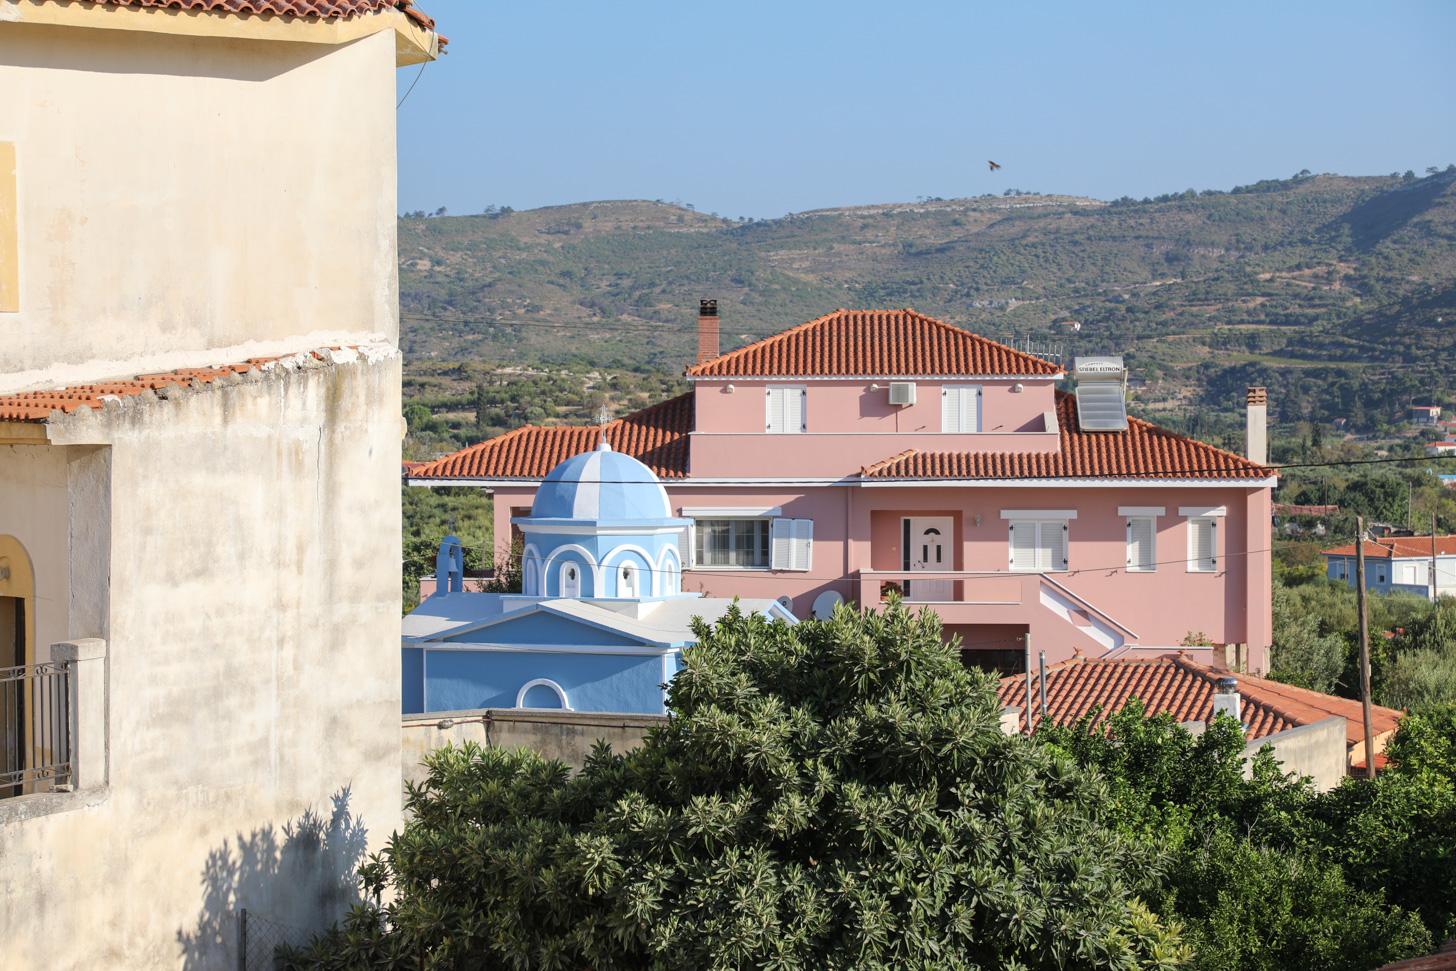 Het dorp Mitilinii